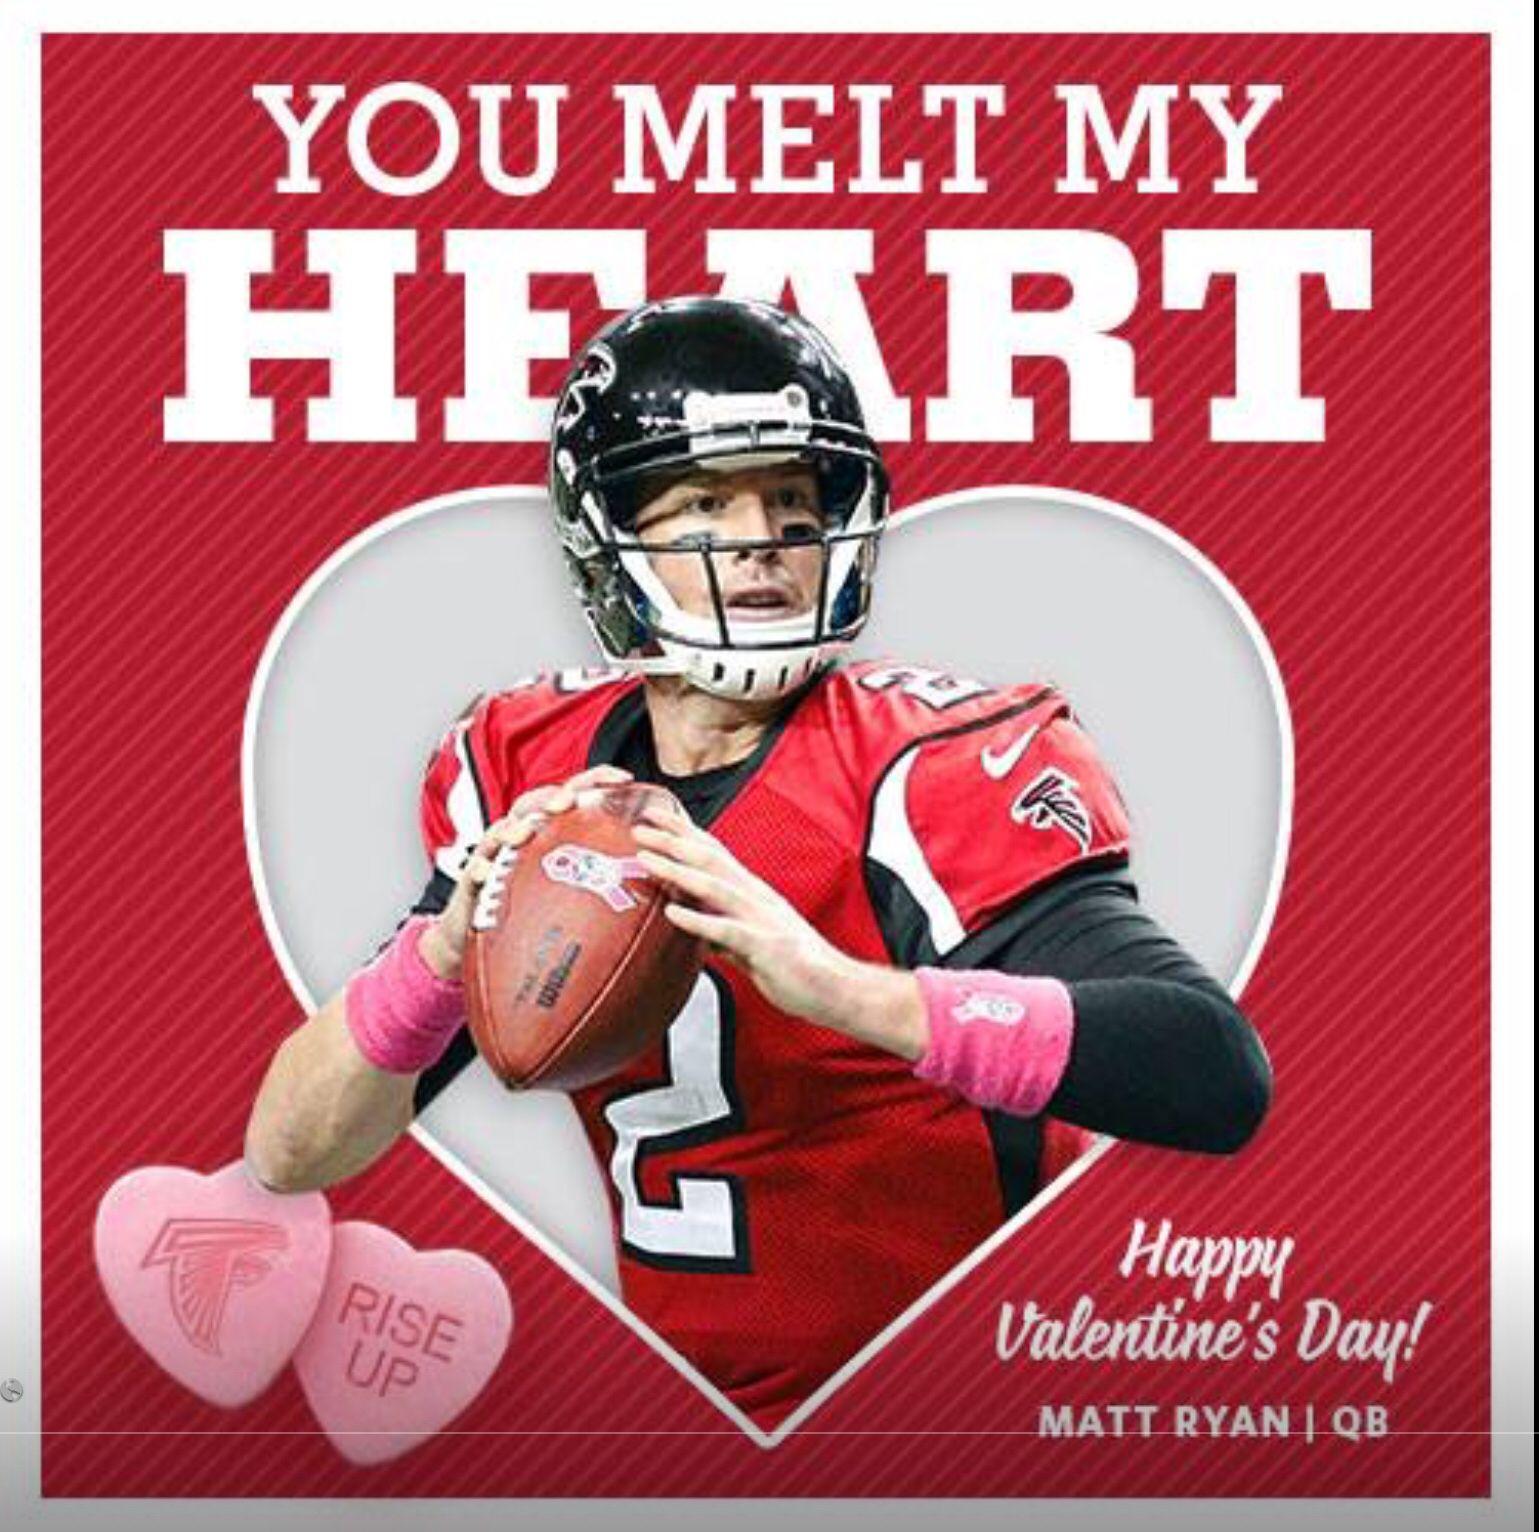 Happy Valentine S Day To Me 3 Dallas Cowboys Happy Birthday Happy Valentines Day Happy Valentine